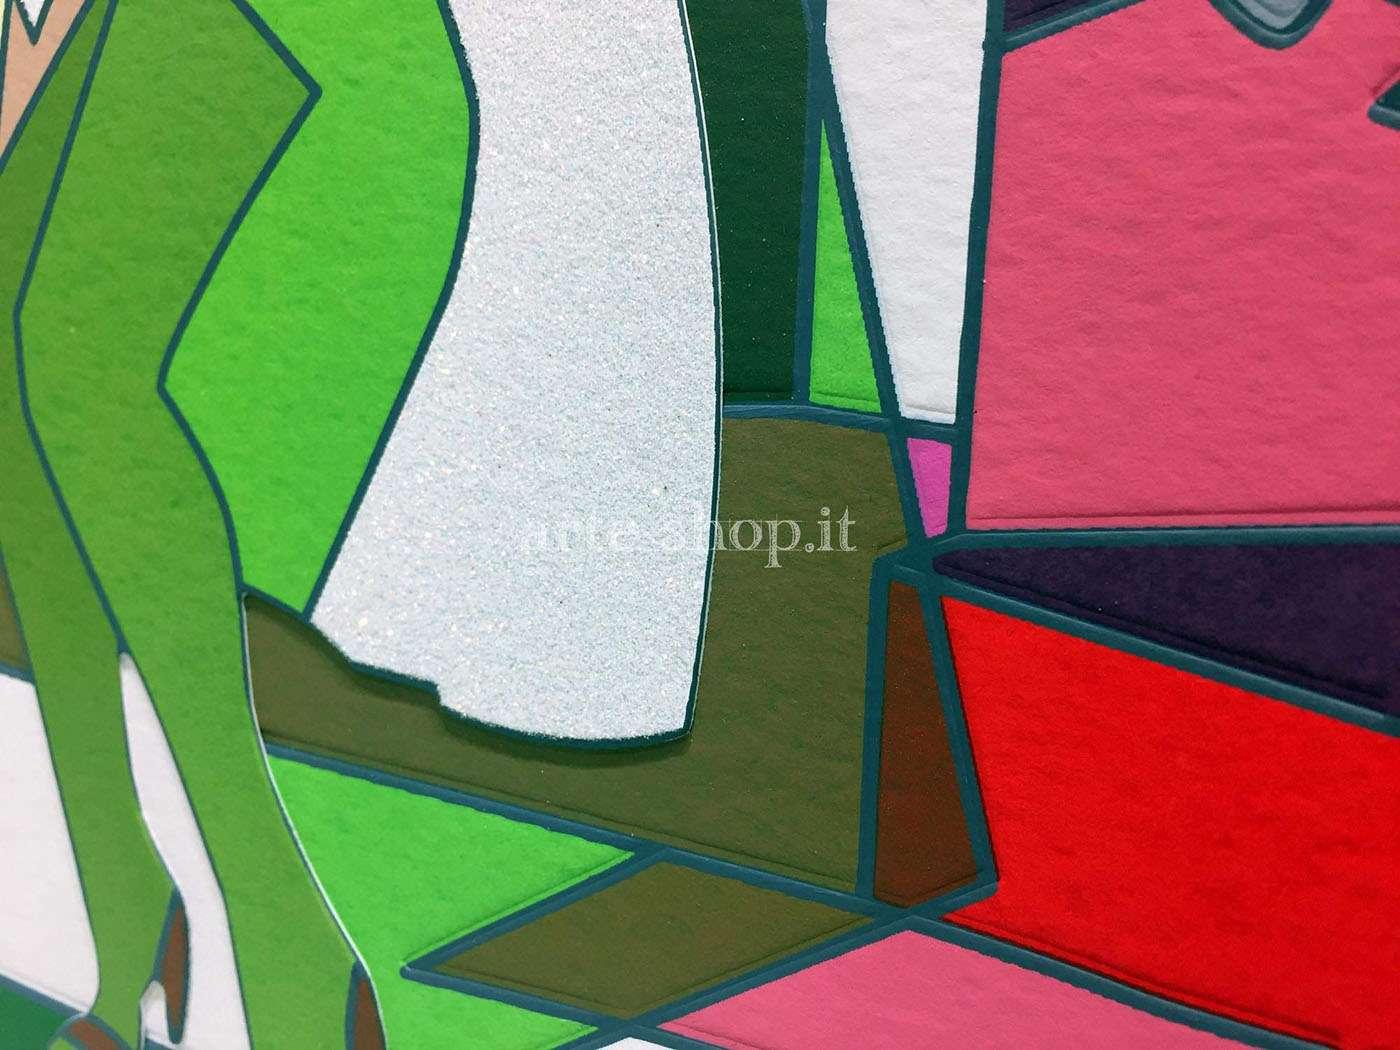 arte pentagono shop dettaglio numero 364